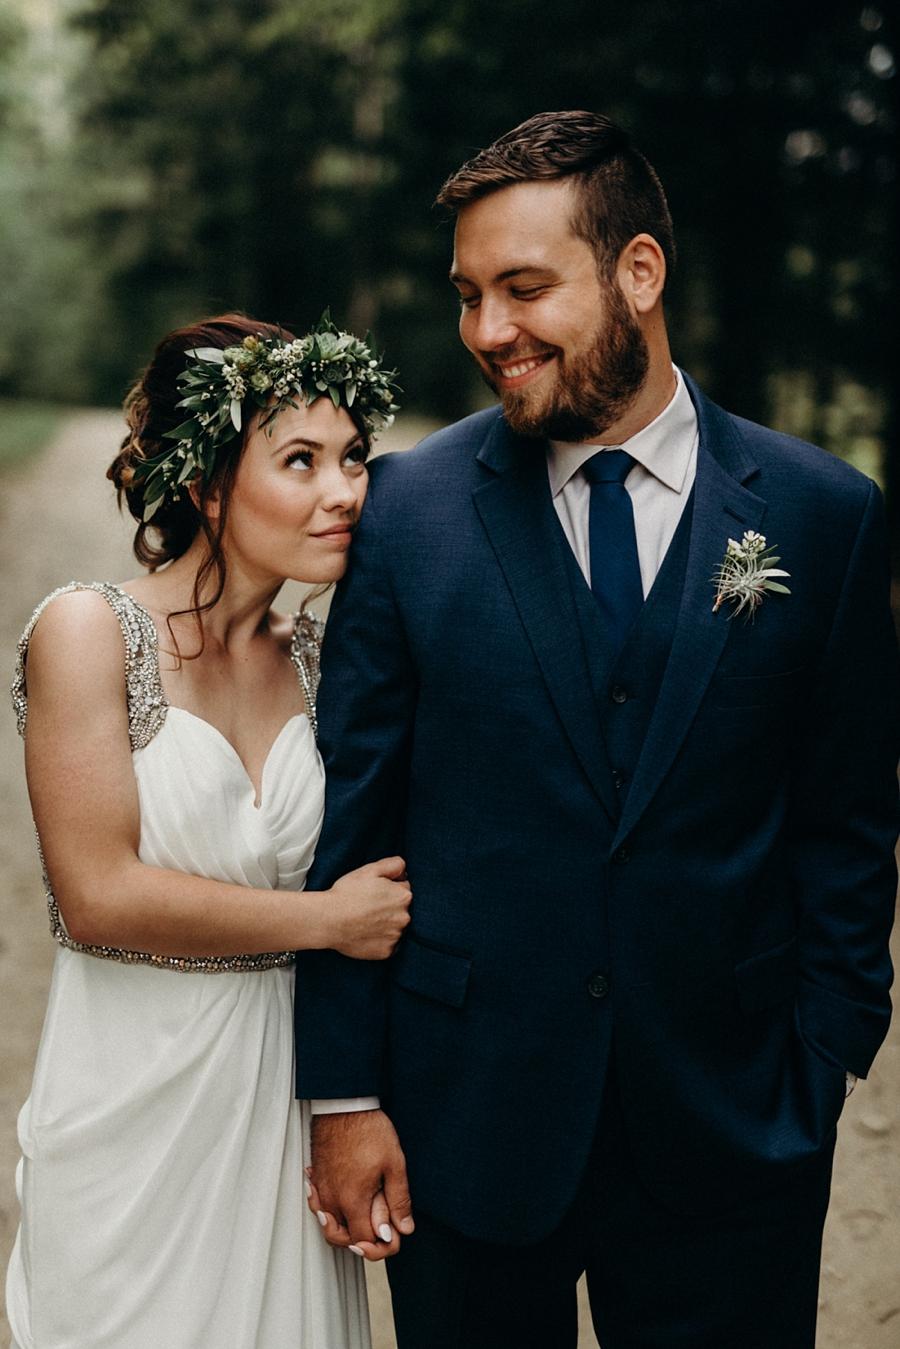 kaihla_tonai_intimate_wedding_elopement_photographer_7284.jpg